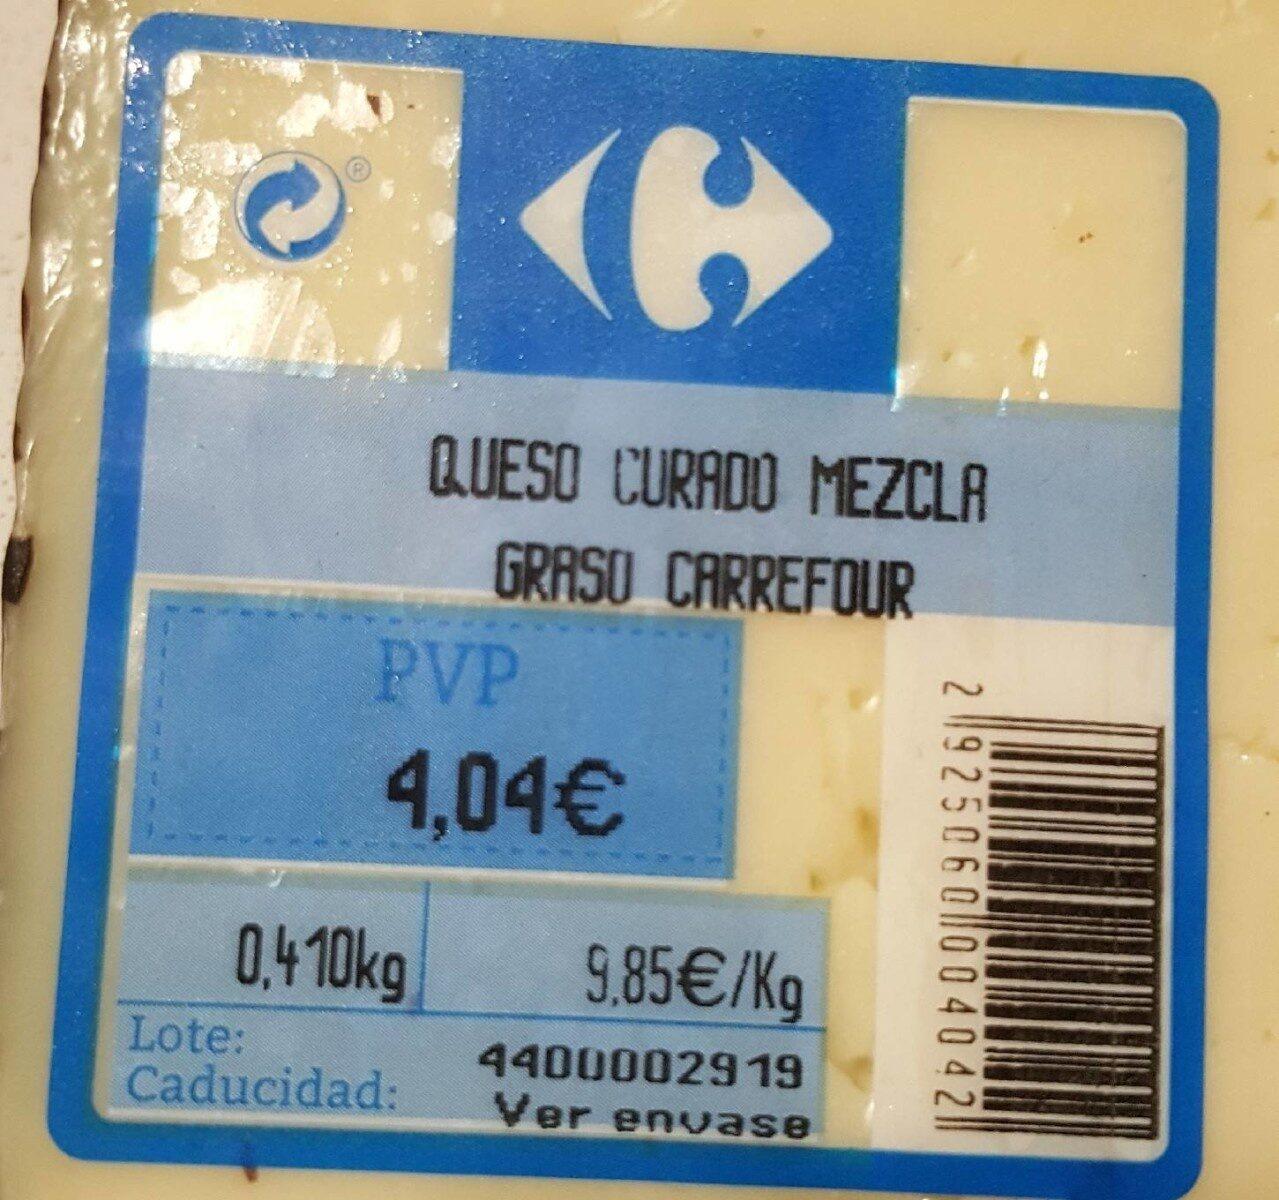 QUESO CURADO MEZCLA GRADO CARREFOUR - Produit - es